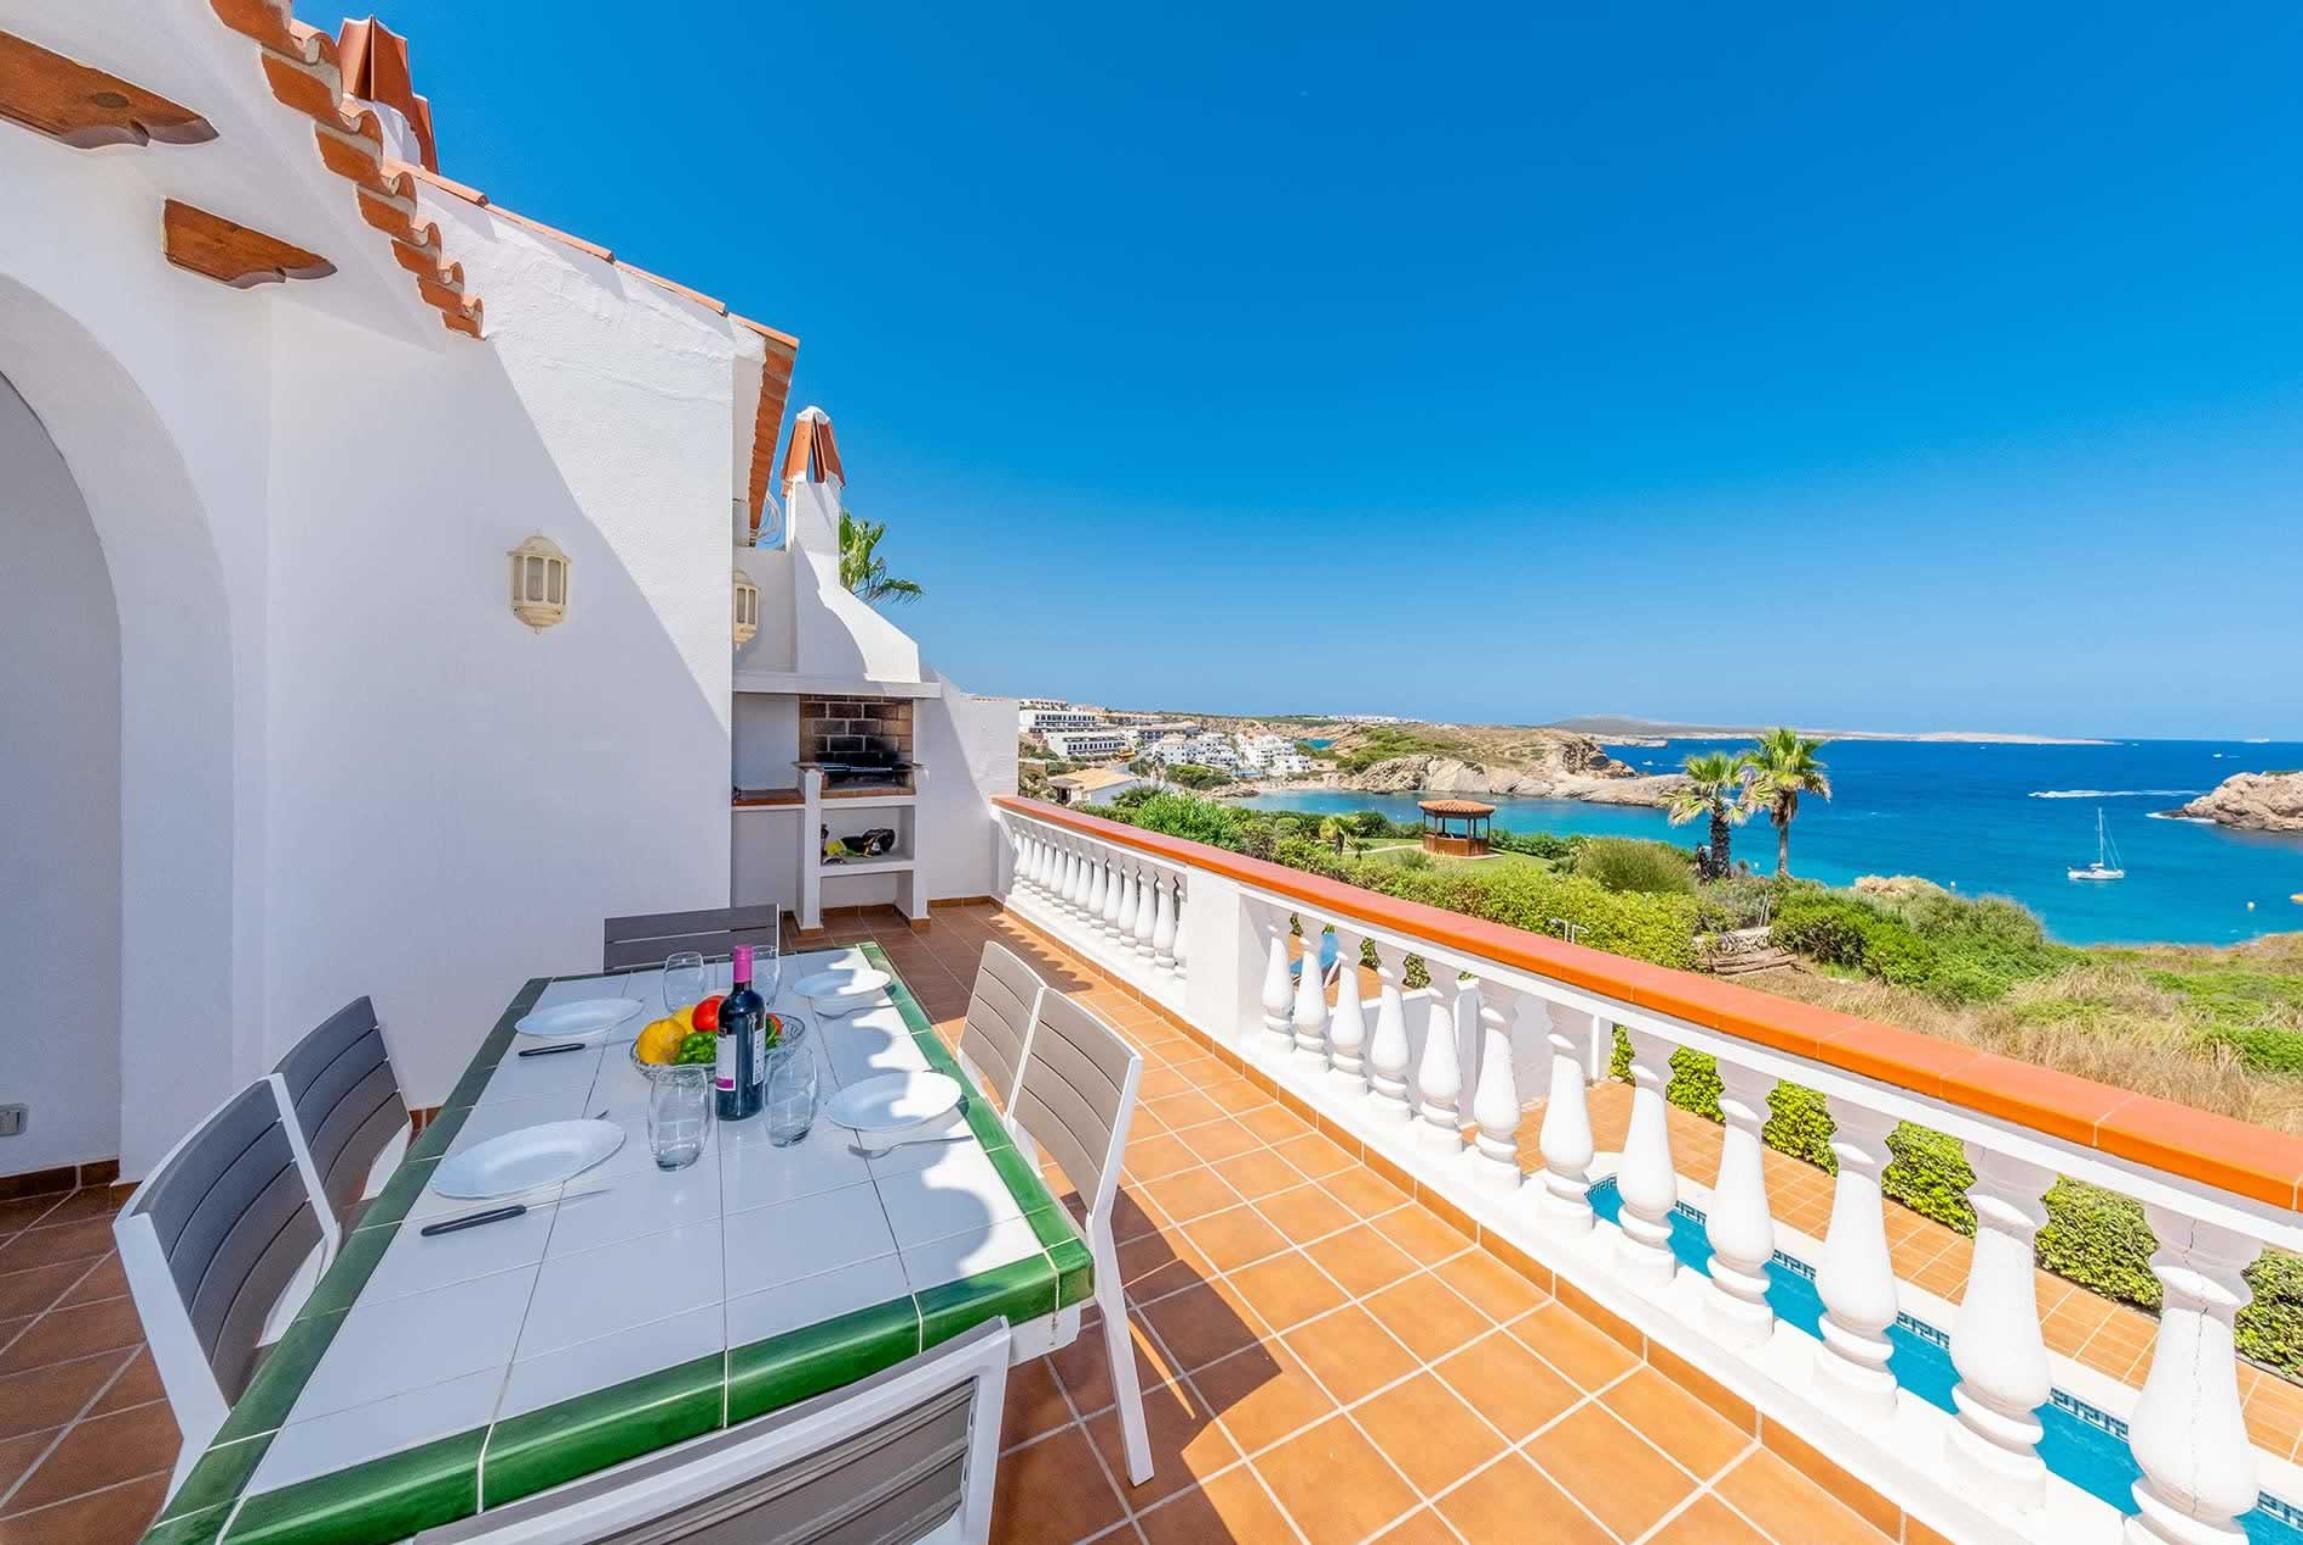 Ferienhaus Bellavista II (2654270), Arenal De'N Castell, Menorca, Balearische Inseln, Spanien, Bild 26